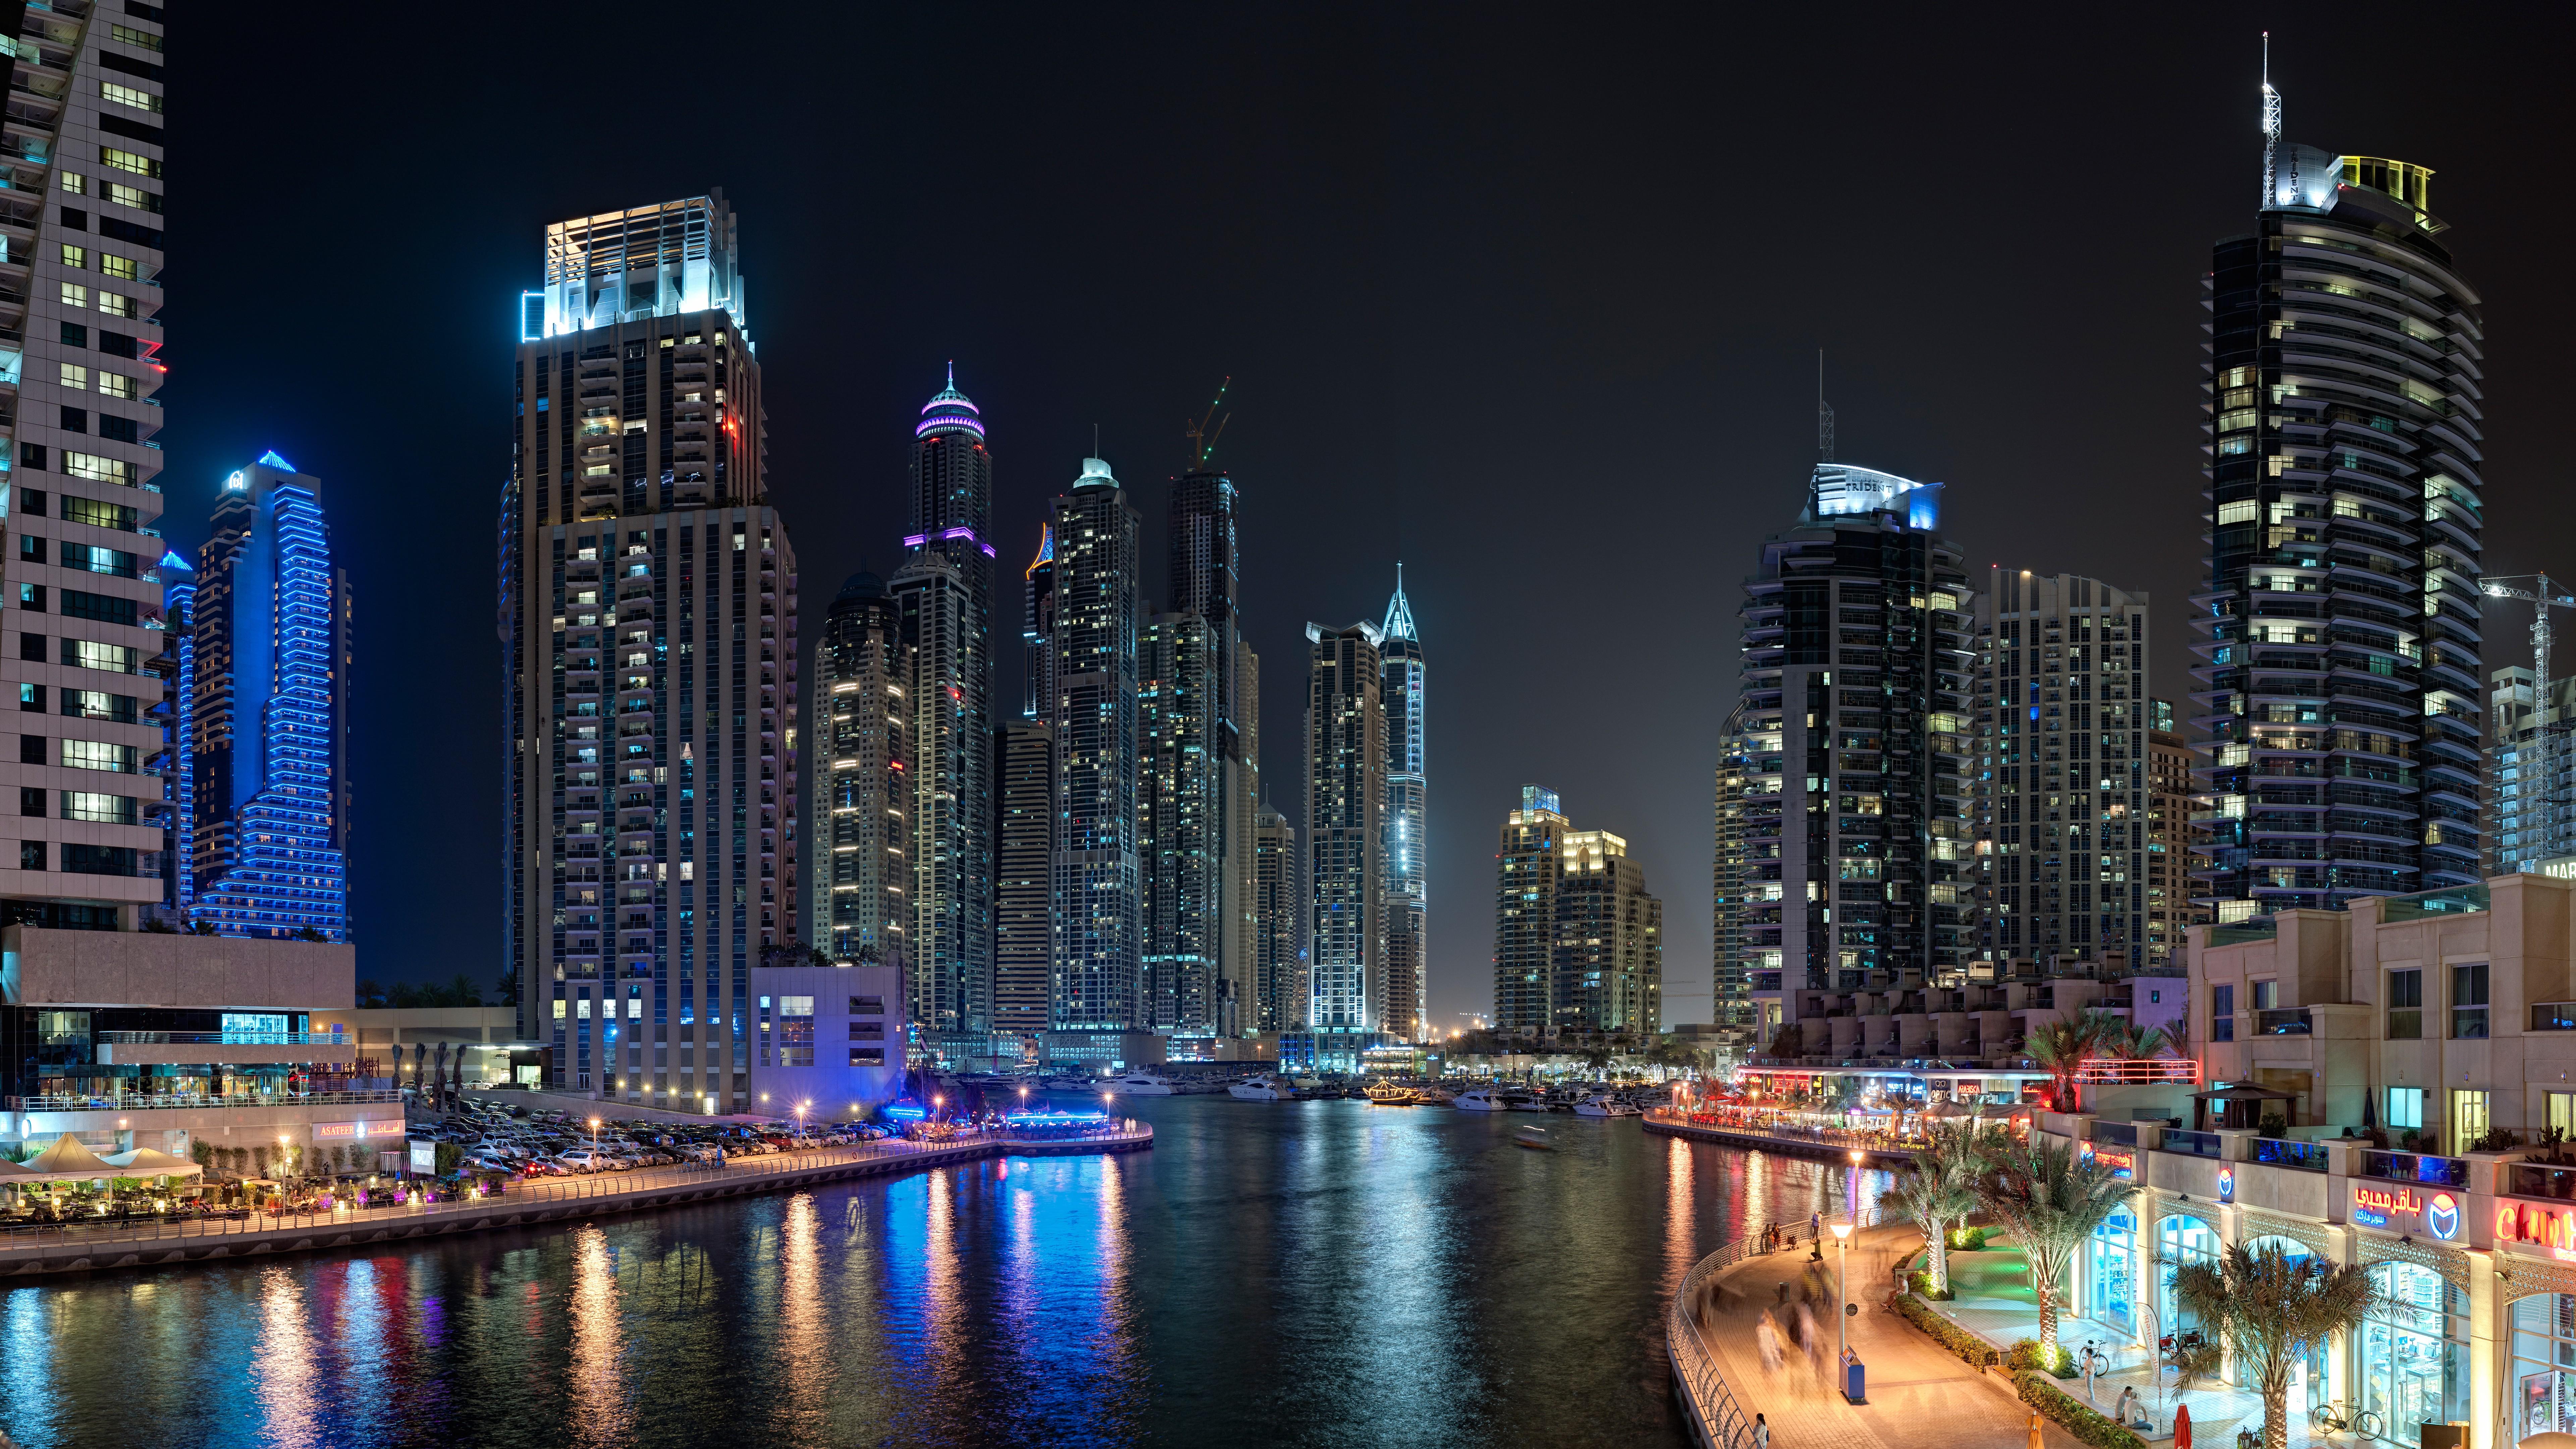 Best Wallpaper Night Dubai - dubai-7680x4320-marina-yacth-club-sea-lake-water-night-light-travel-894  Snapshot-684245.jpg